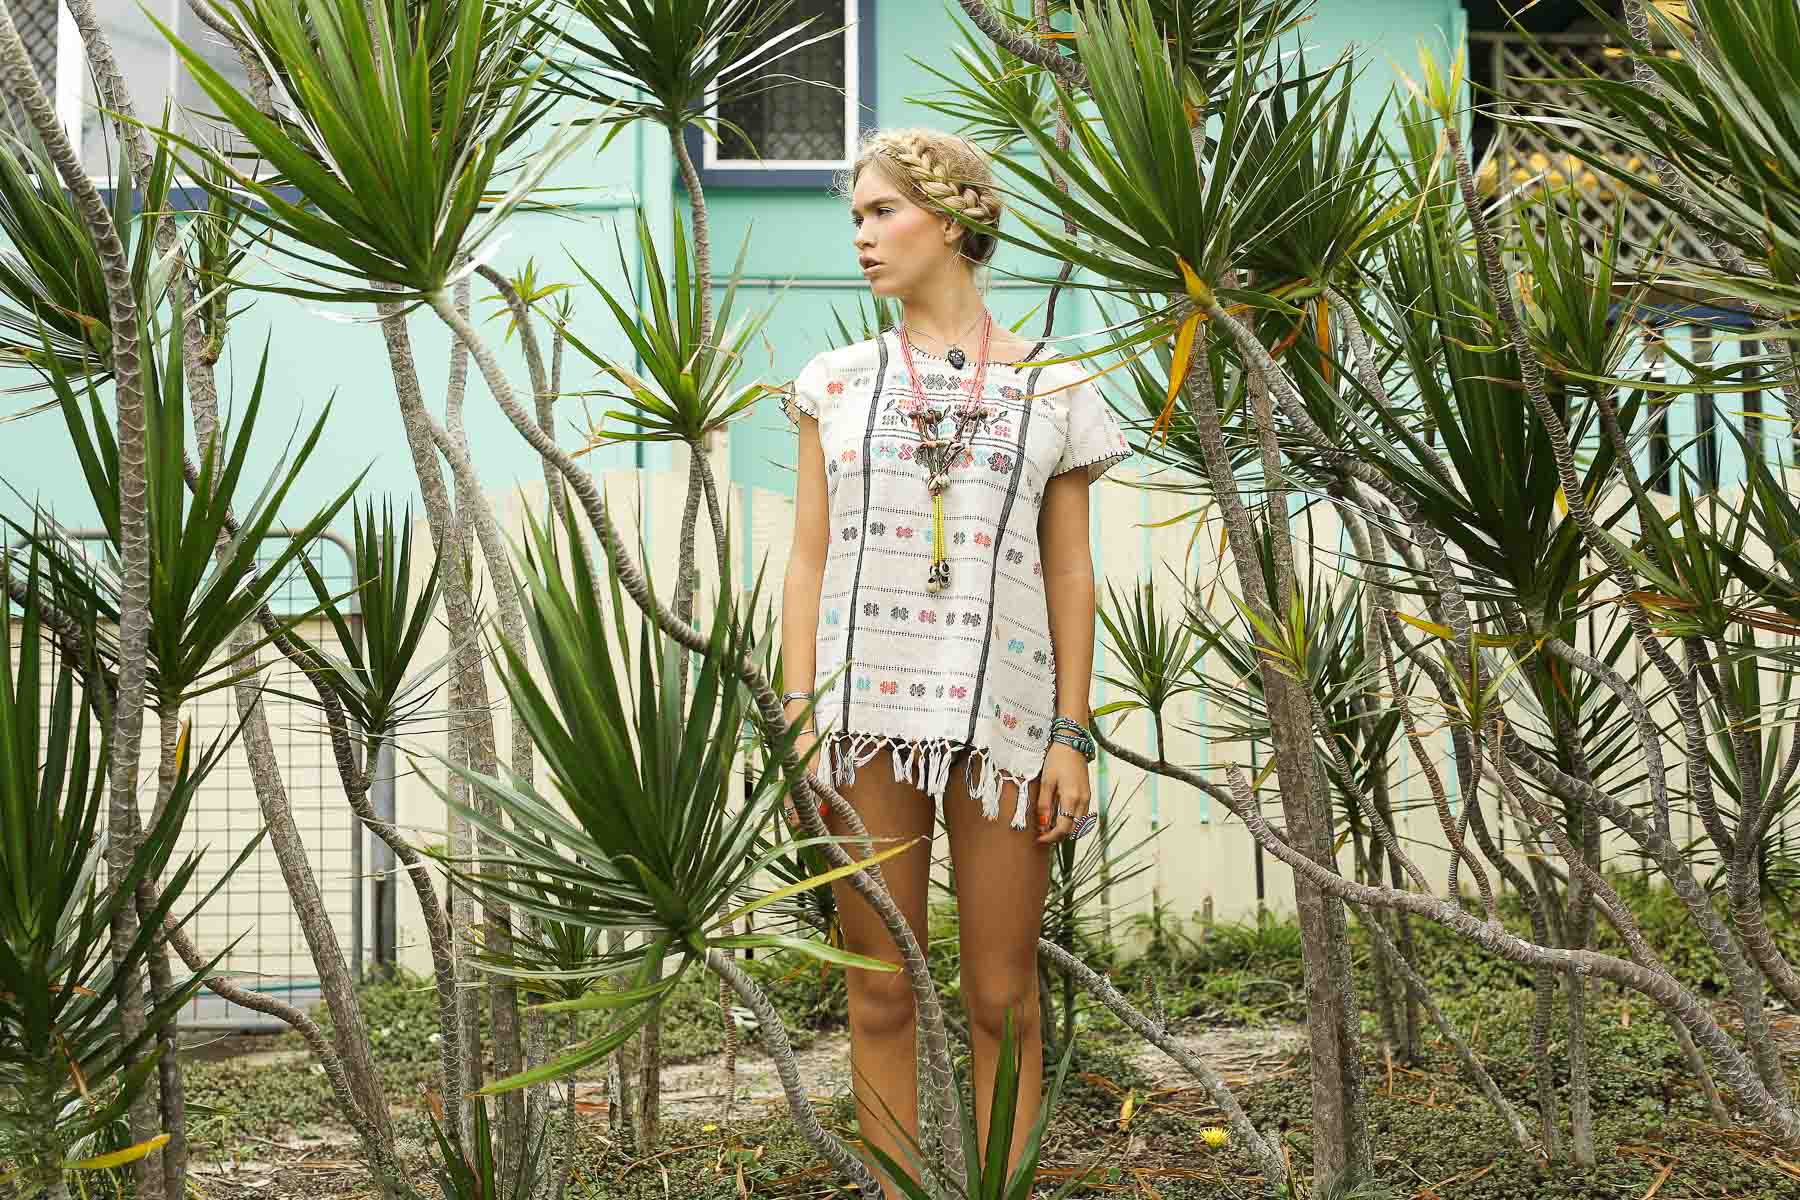 Fashion photography by Claudio Kirac, Photographer Gold Coast